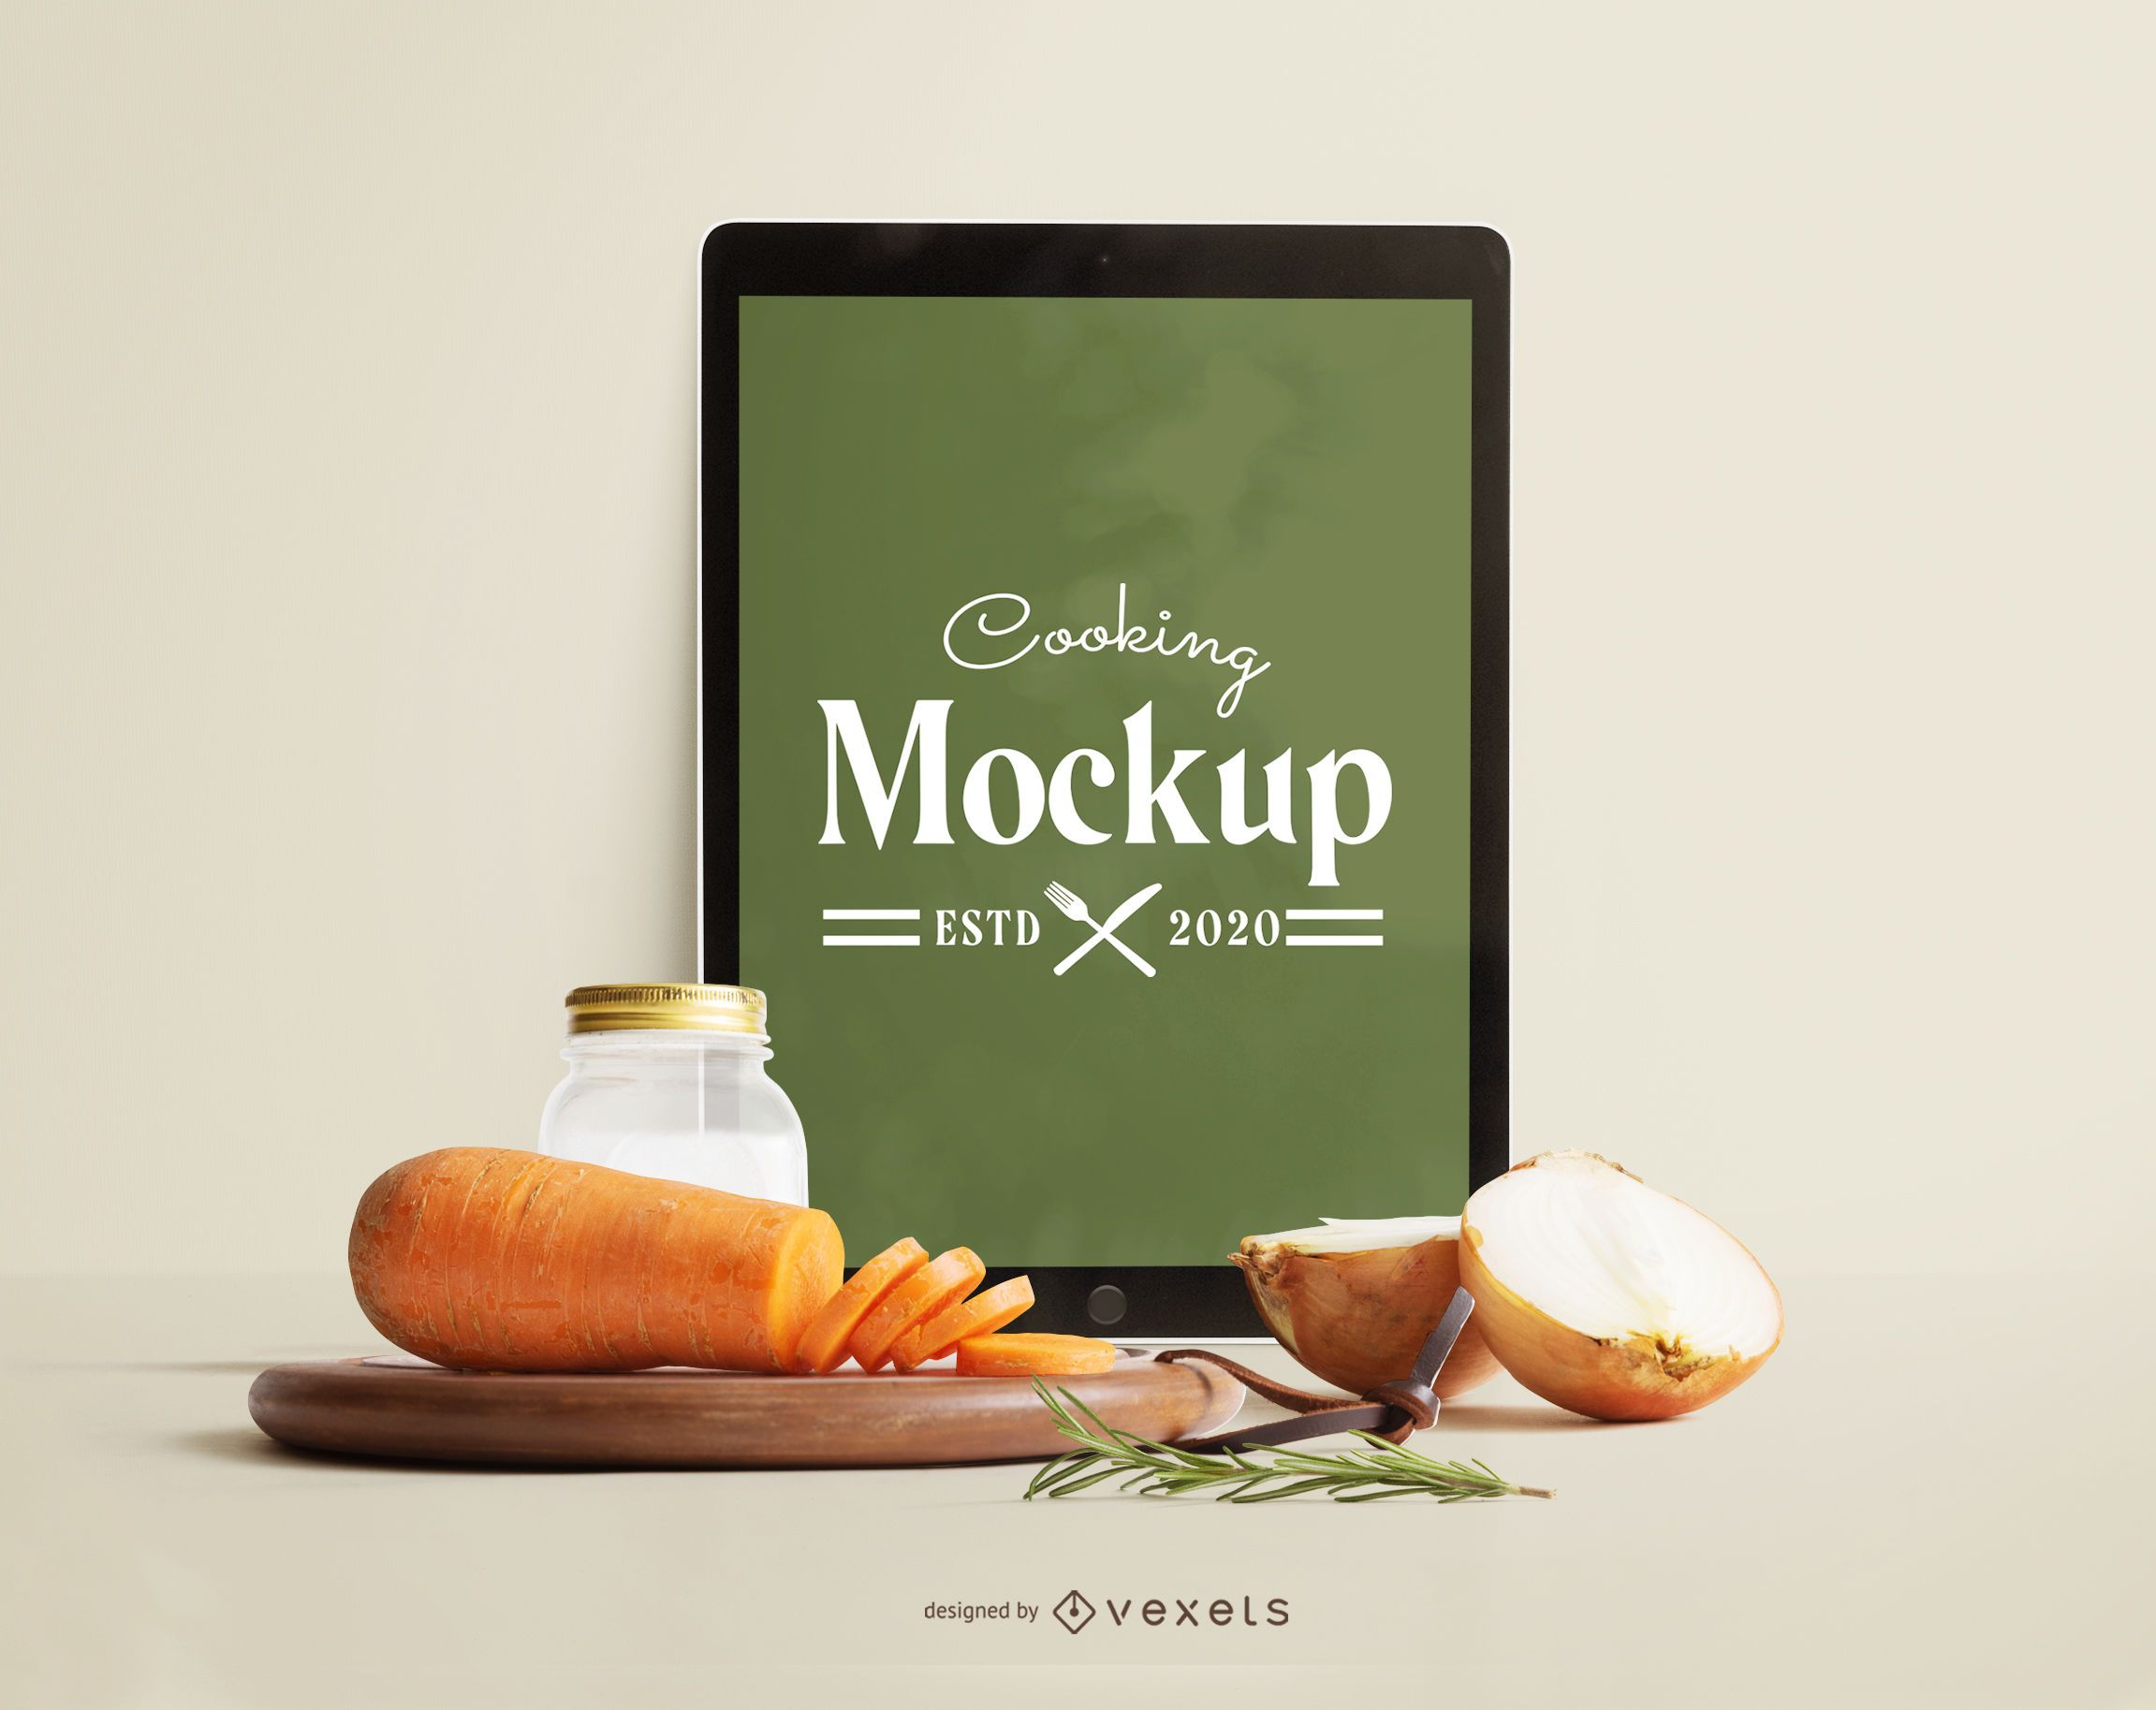 Ipad vegetables mockup composition